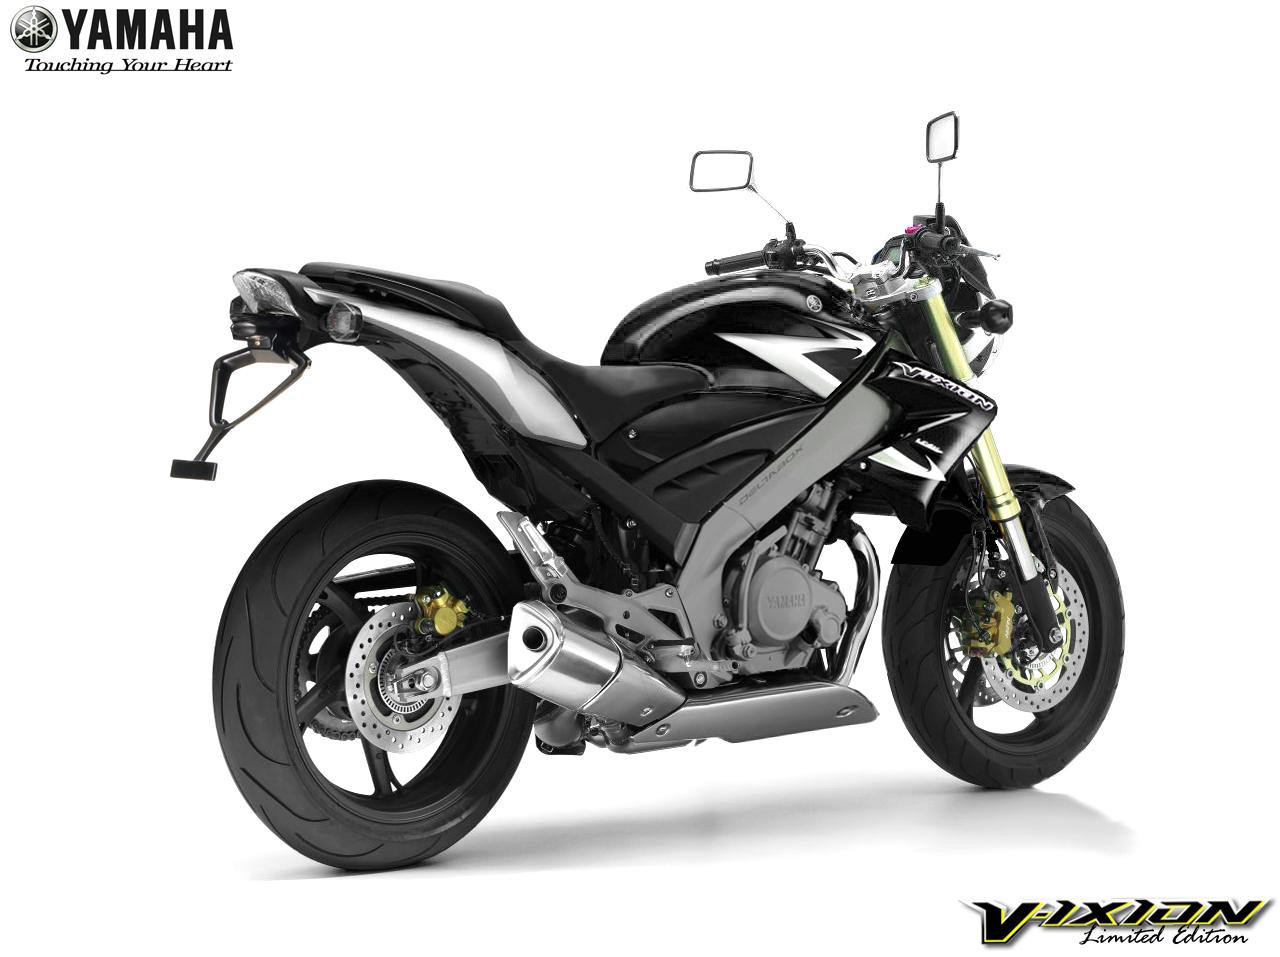 Yamaha Scorpio & V-Ixion Limited Edition Otomotif modifikasi mobil